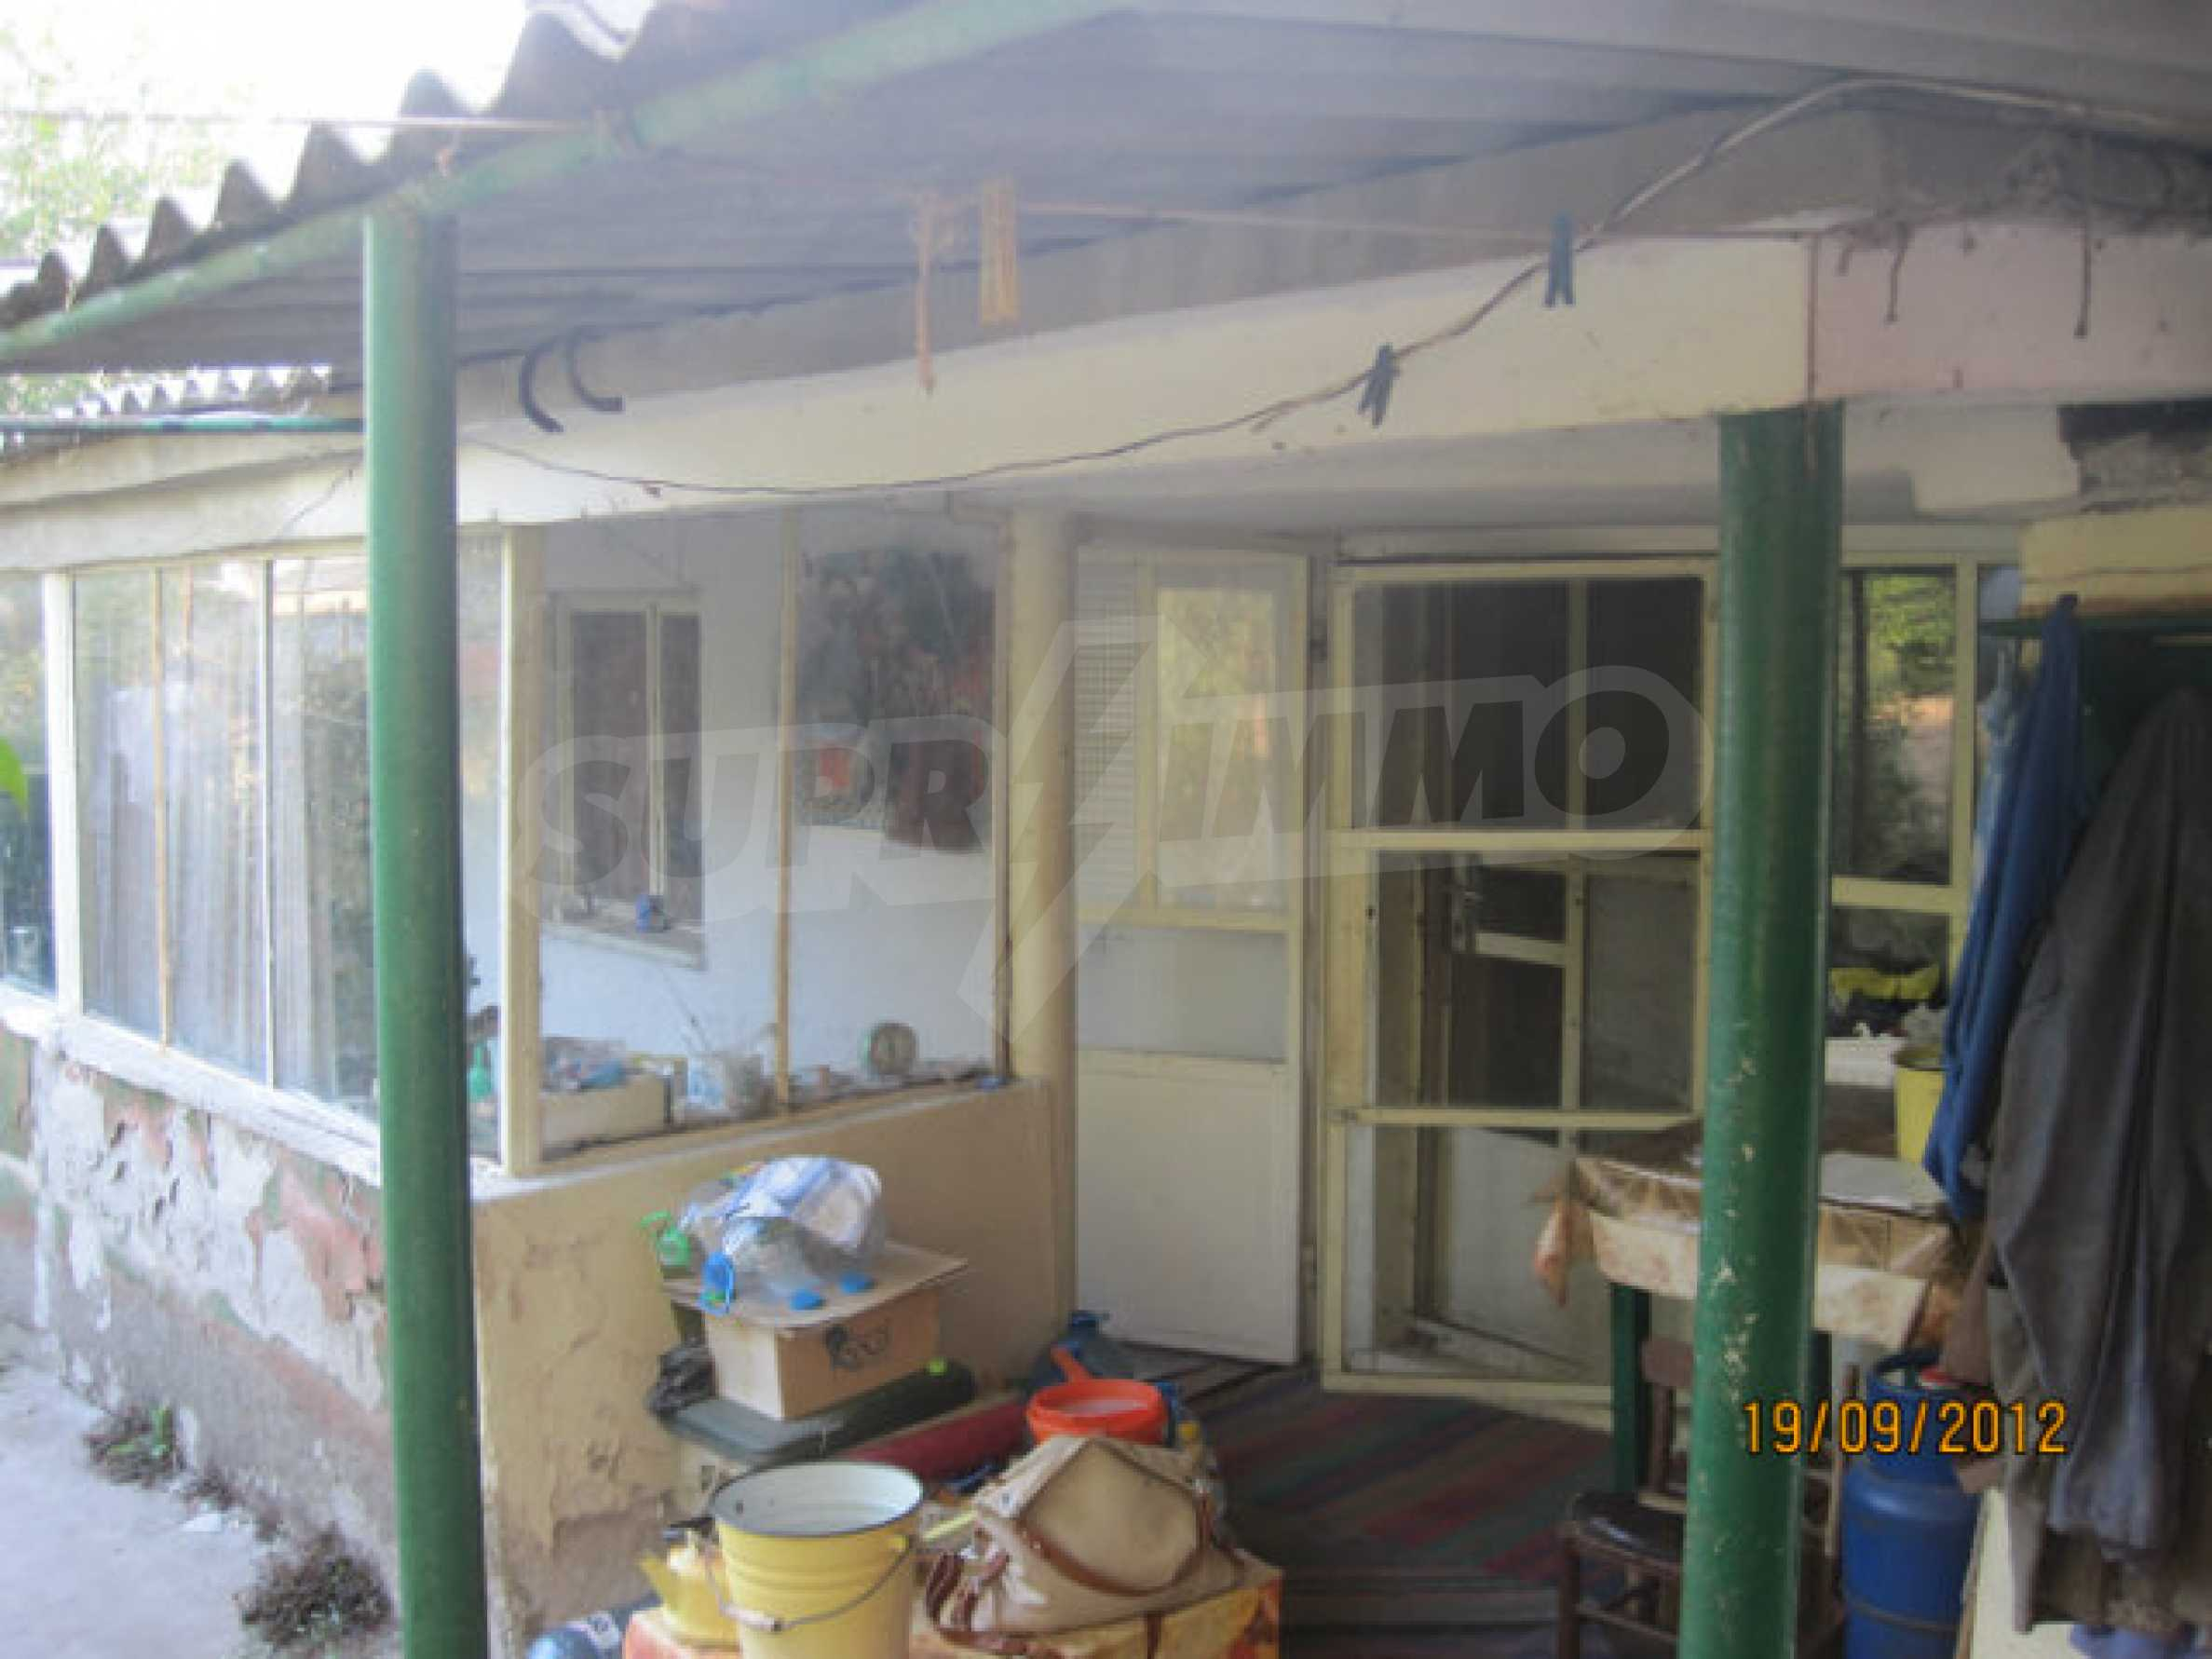 Detached house for sale in a quiet village near Dimitrovgrad 2